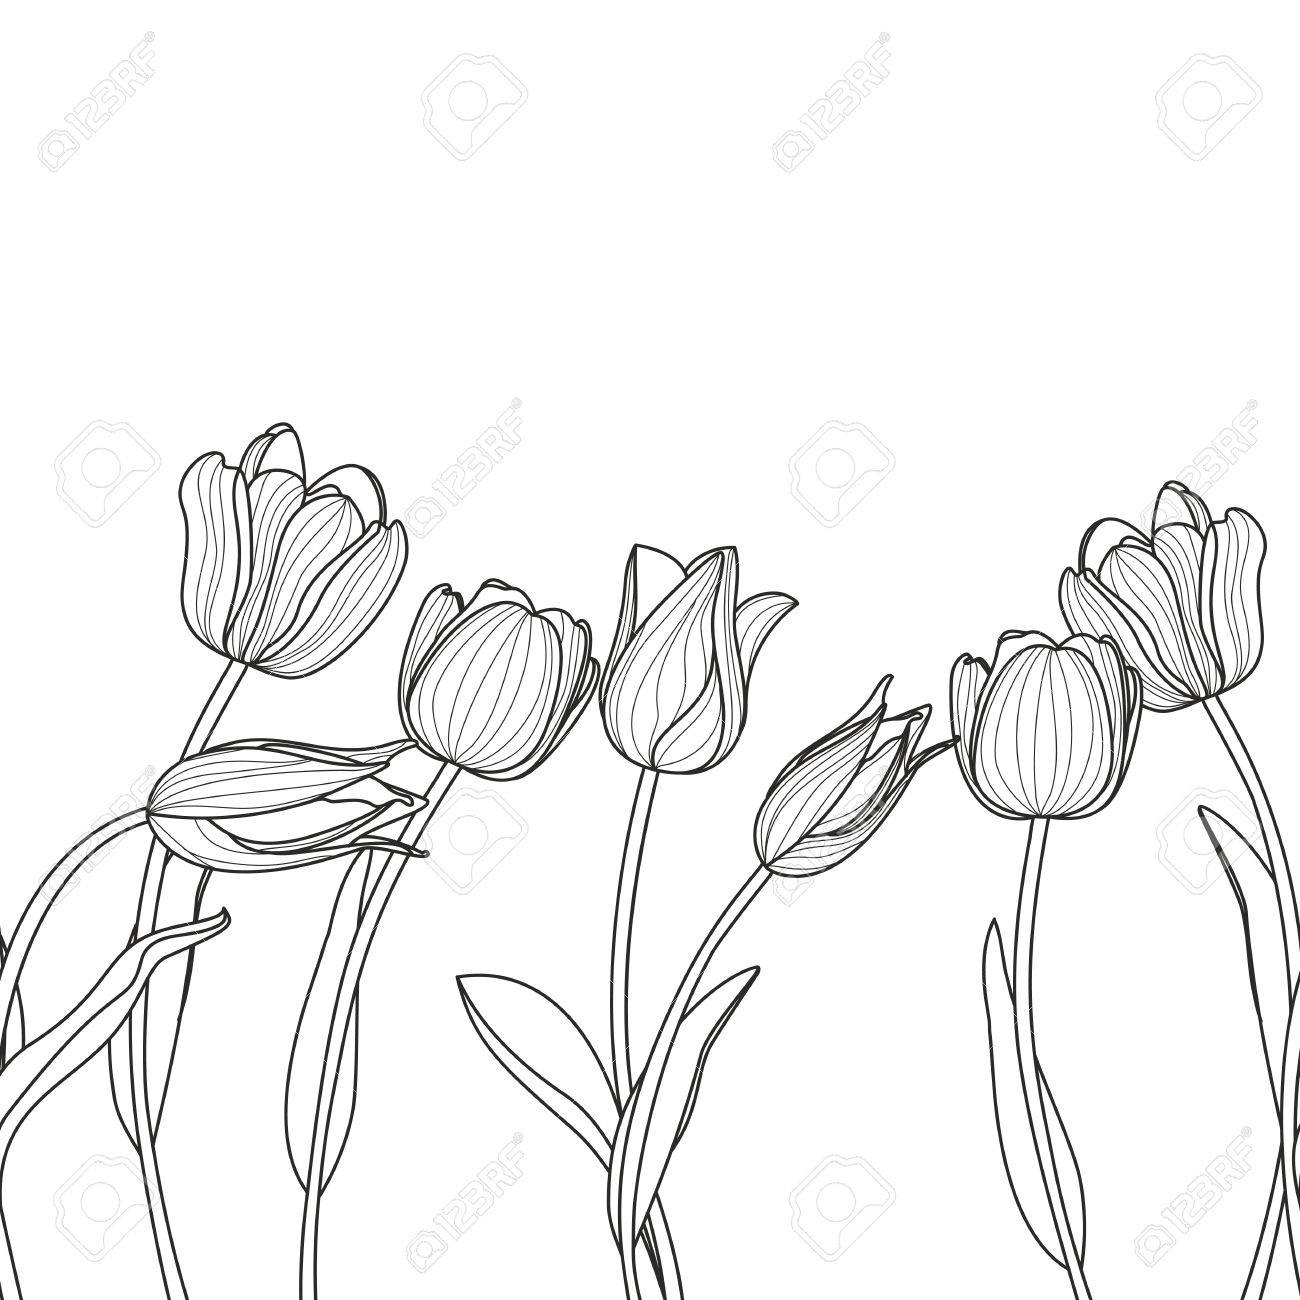 Floral Seamless Horizontal Pattern Black And White Elegant